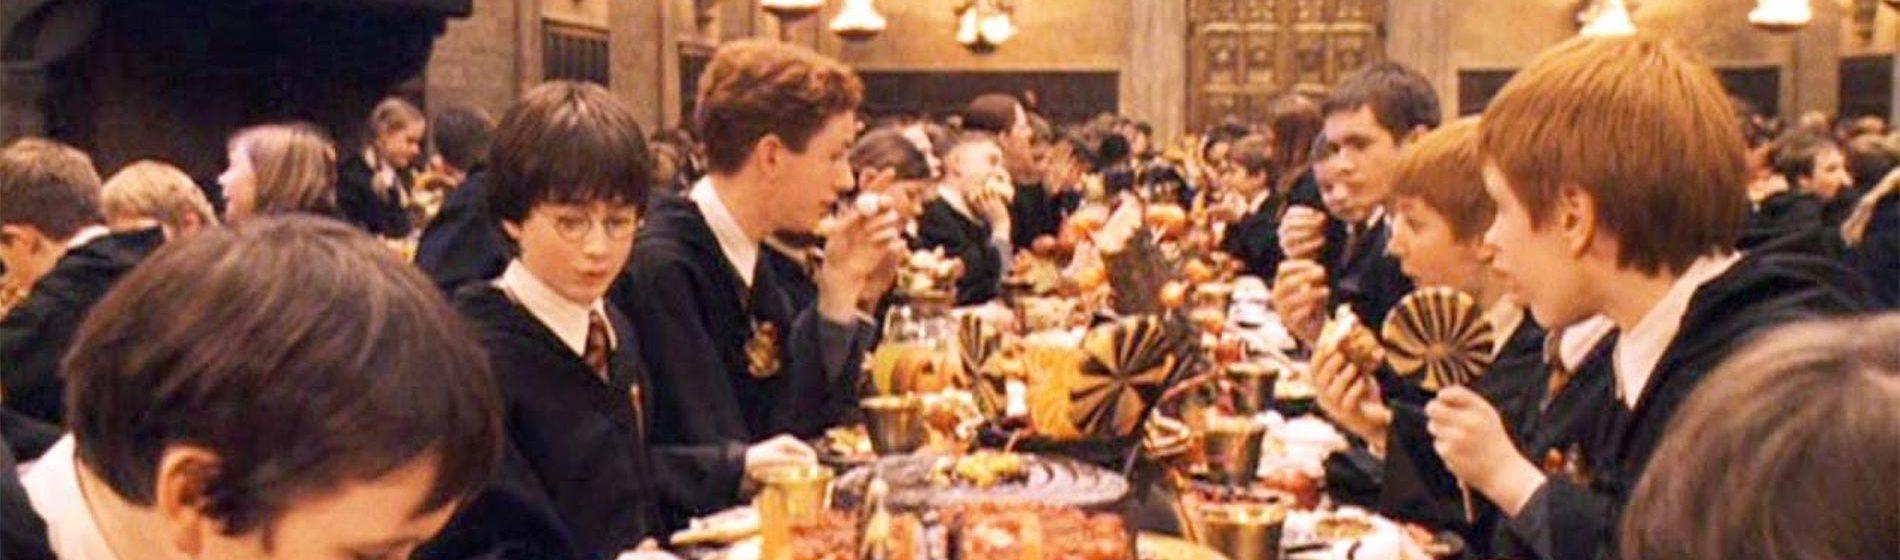 Harry Potter Food